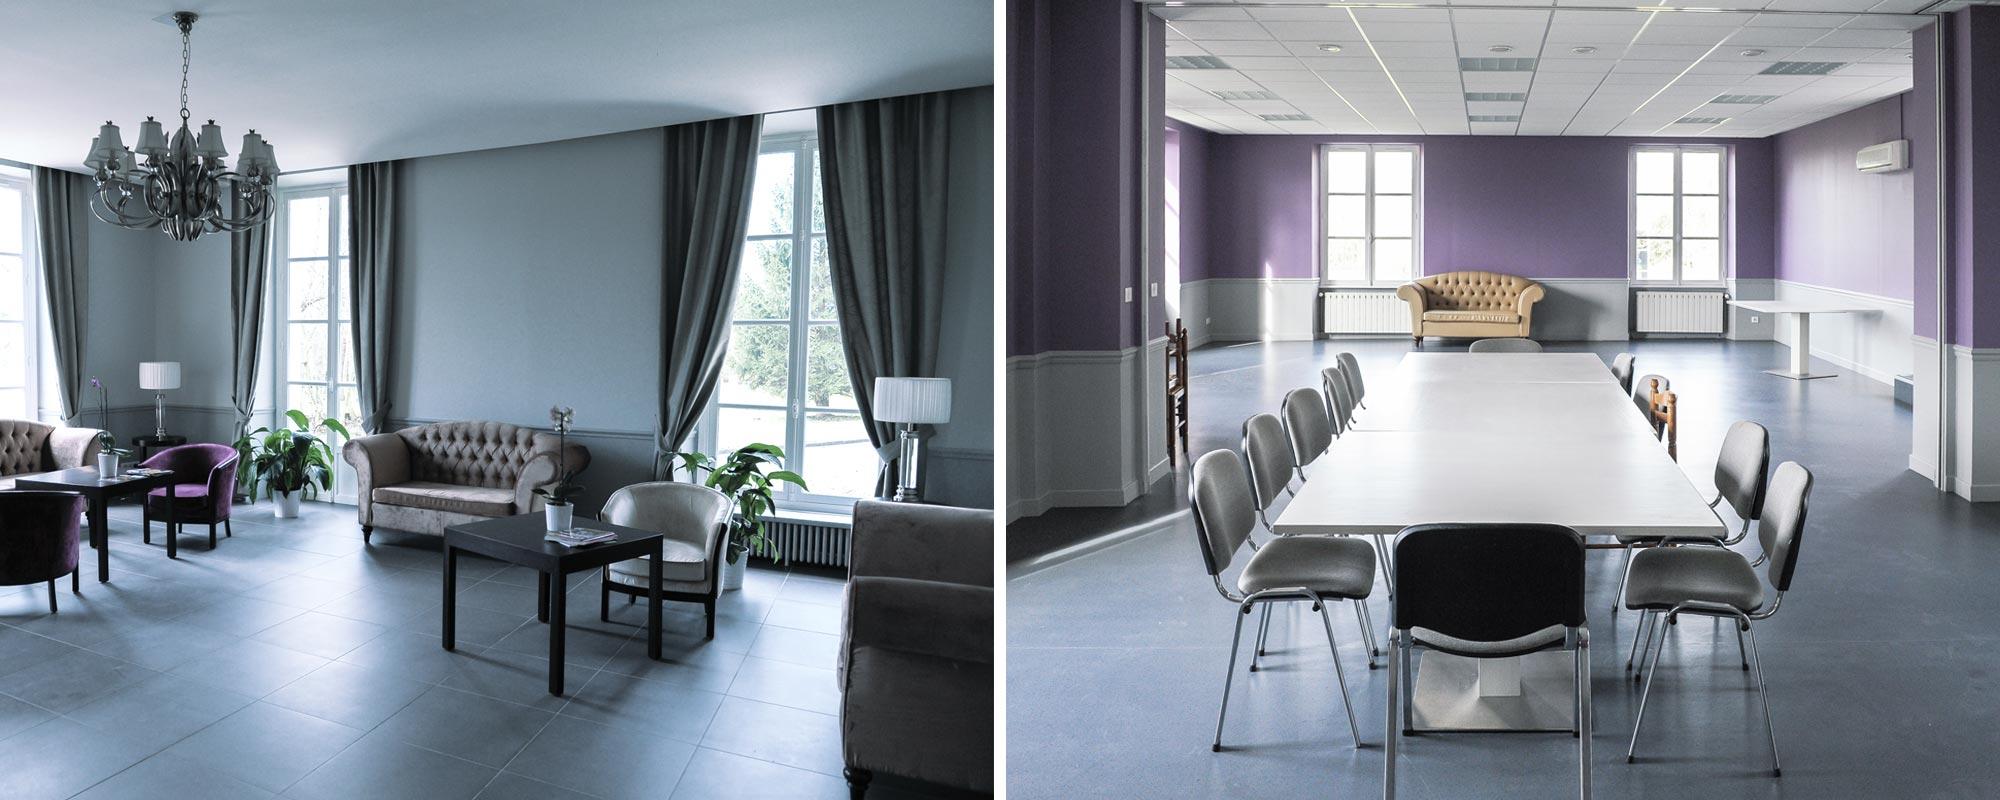 epahd bellefonfaine int rieur 1. Black Bedroom Furniture Sets. Home Design Ideas